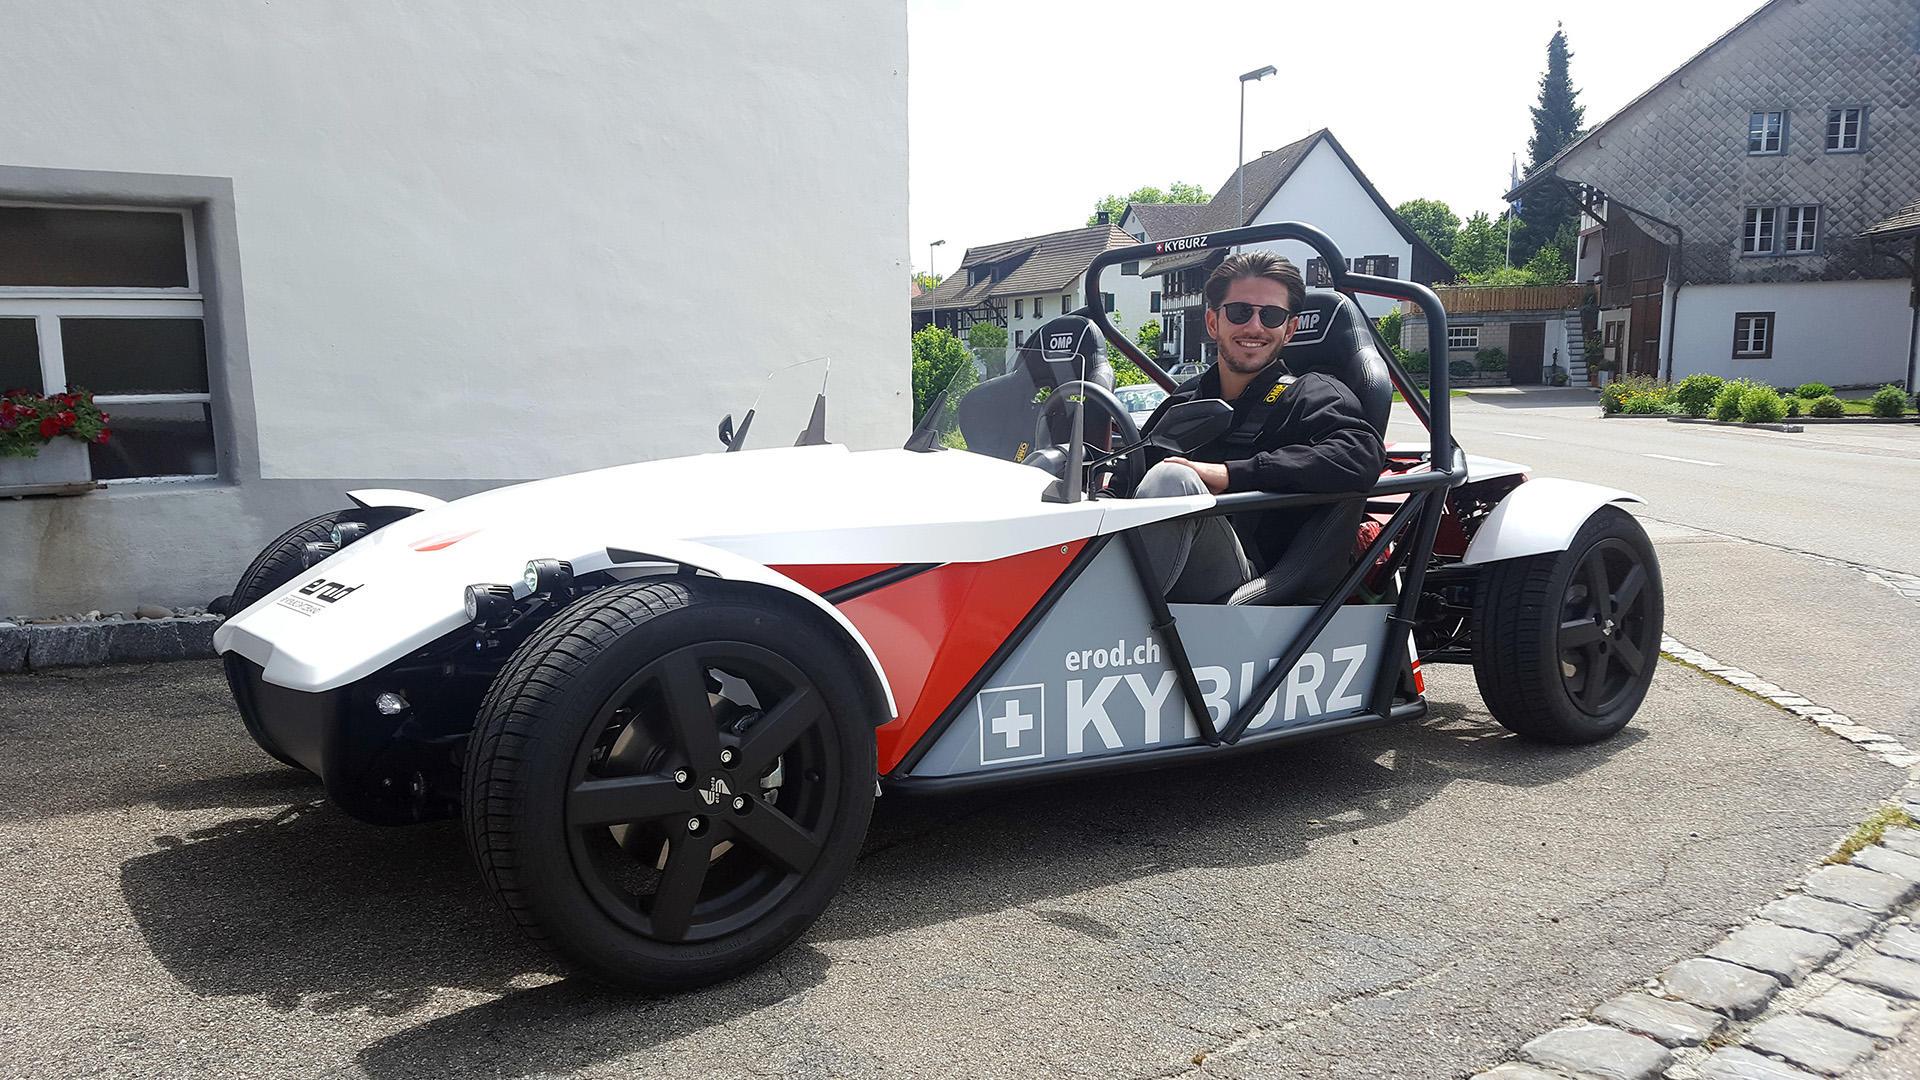 Det sucht Kombi   Soko Autoposer   Fiat 500   Pikes Peak Rennen   Elektro-Funmobile   Folge 445